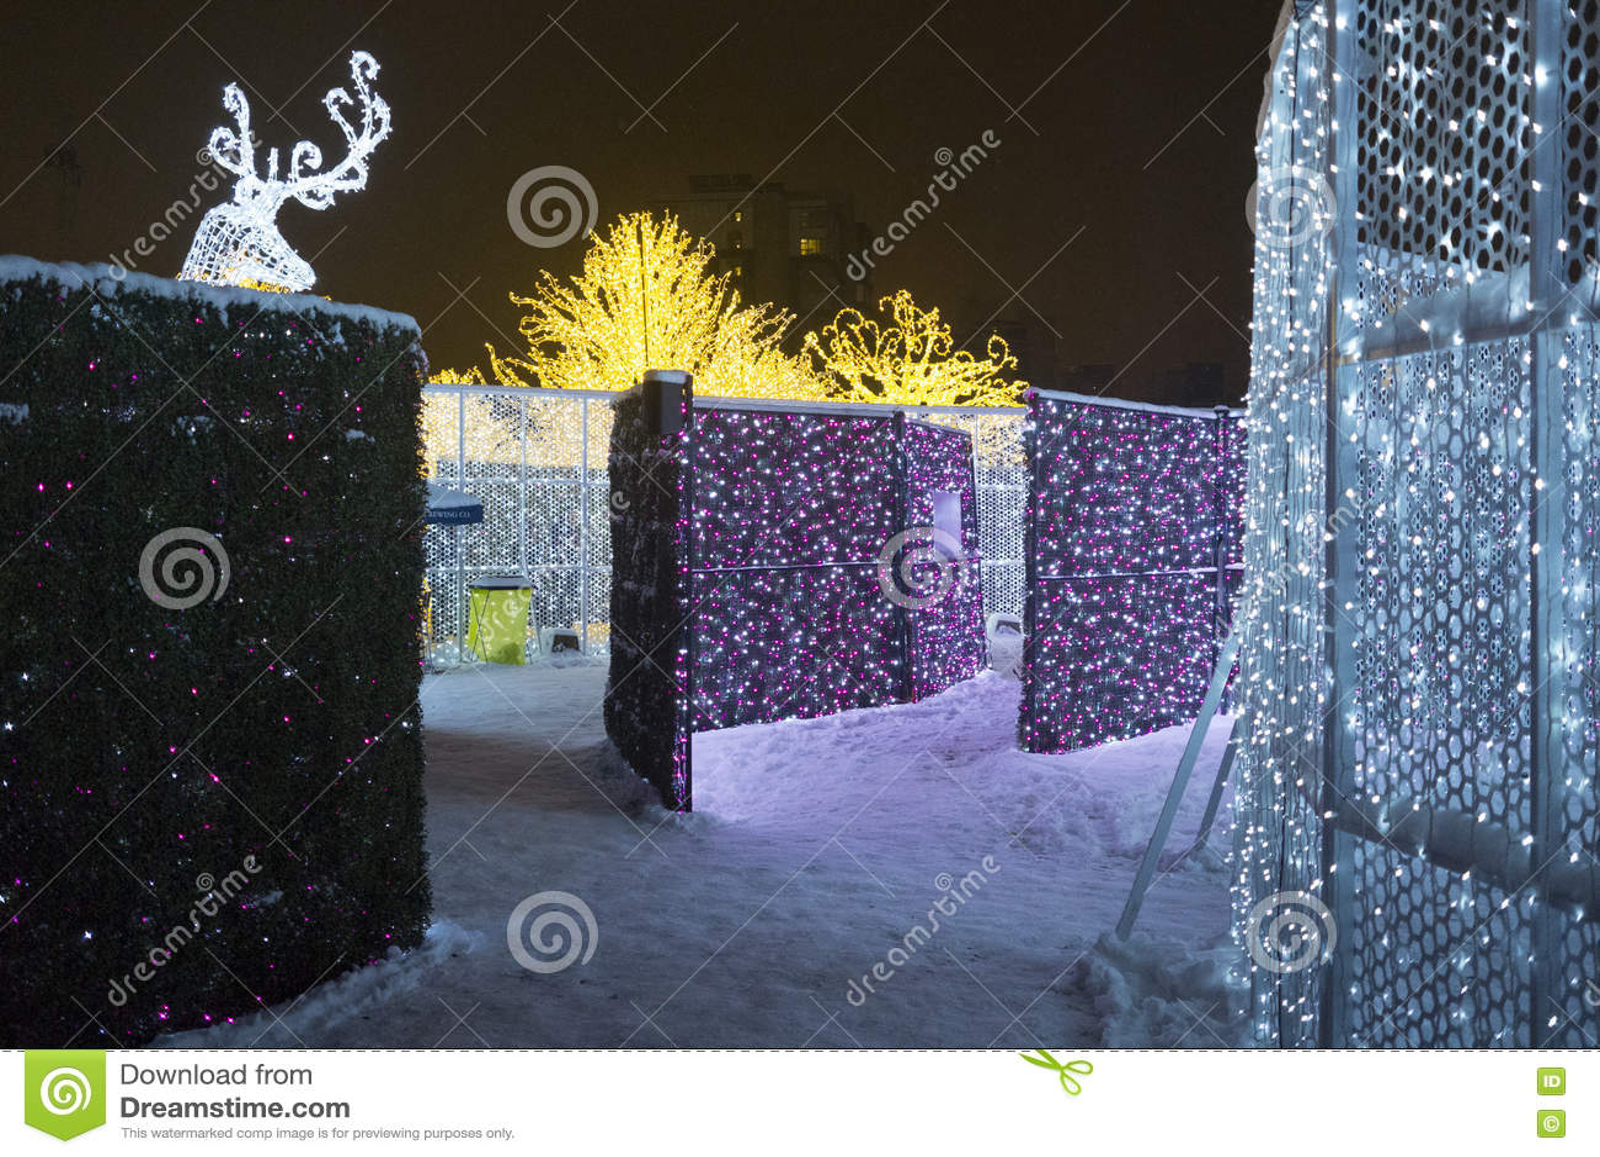 Enchant Christmas.Enchant Christmas Light Maze And Market Stock Photo Image